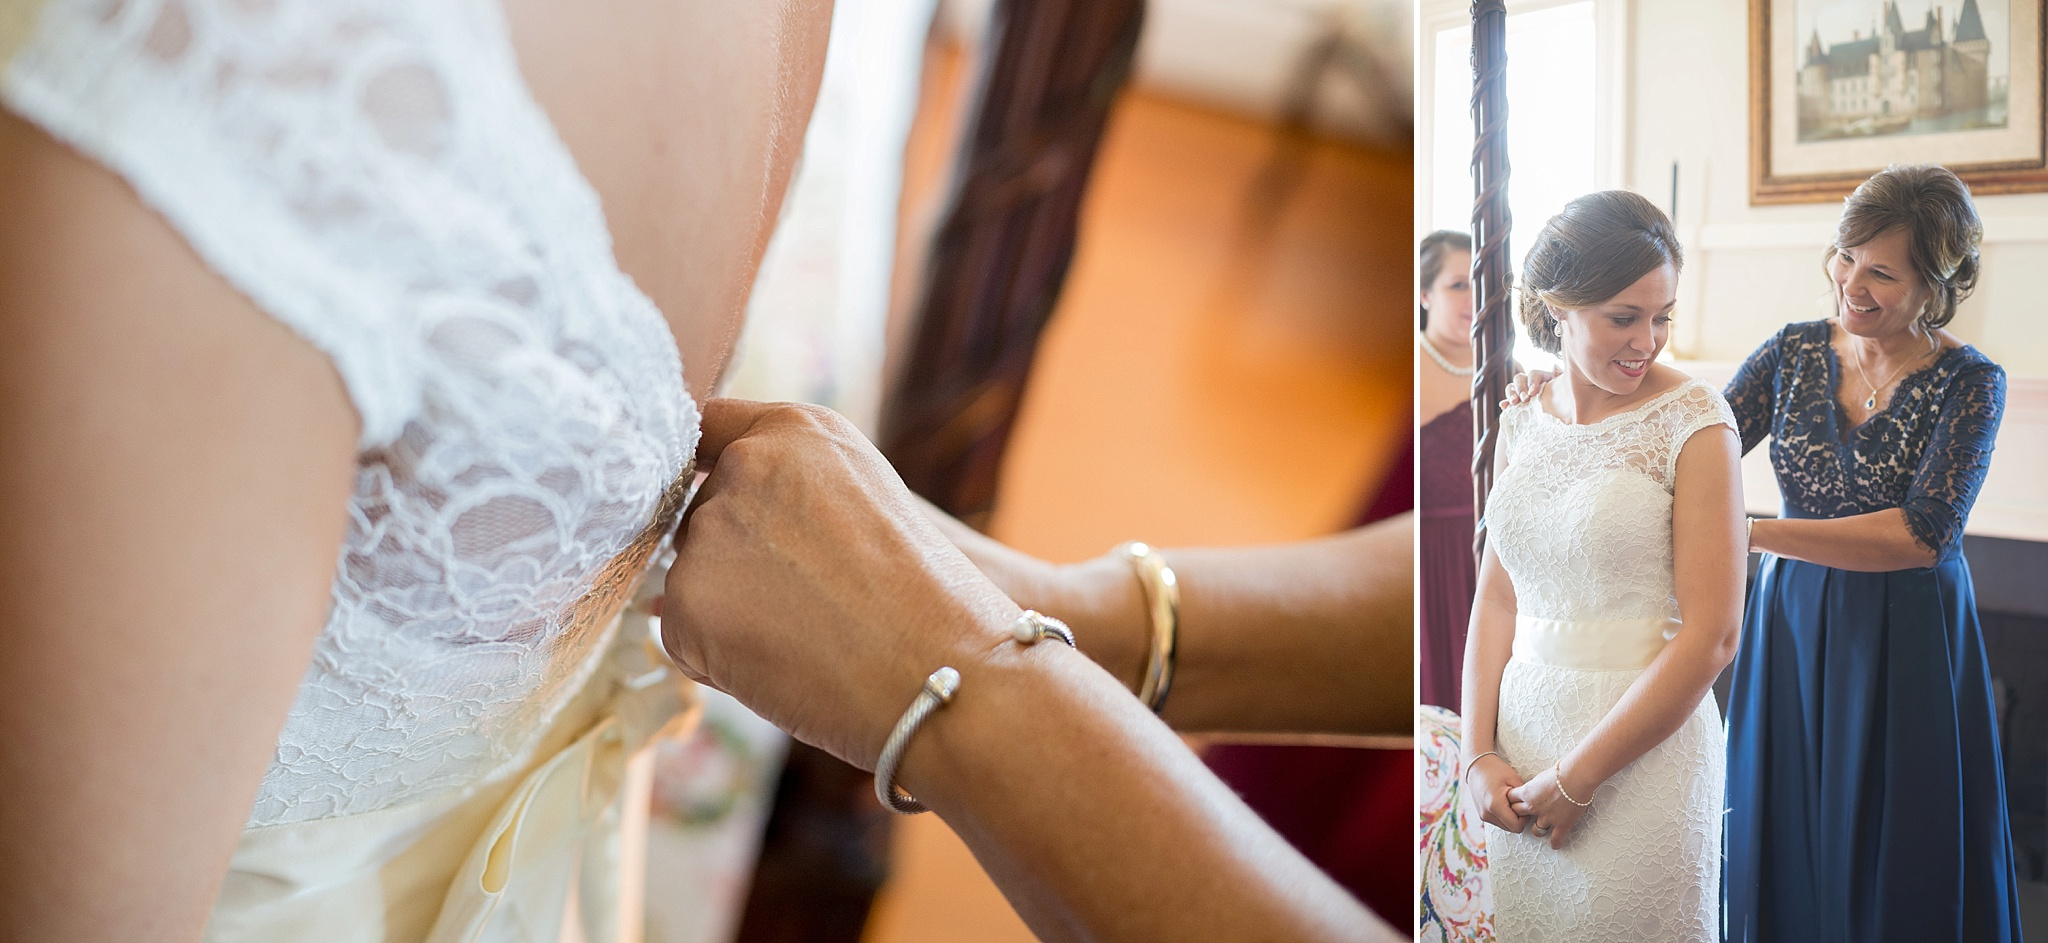 May-Lew-Farm-Farmville-NC-Wedding-Photographer-064.jpg